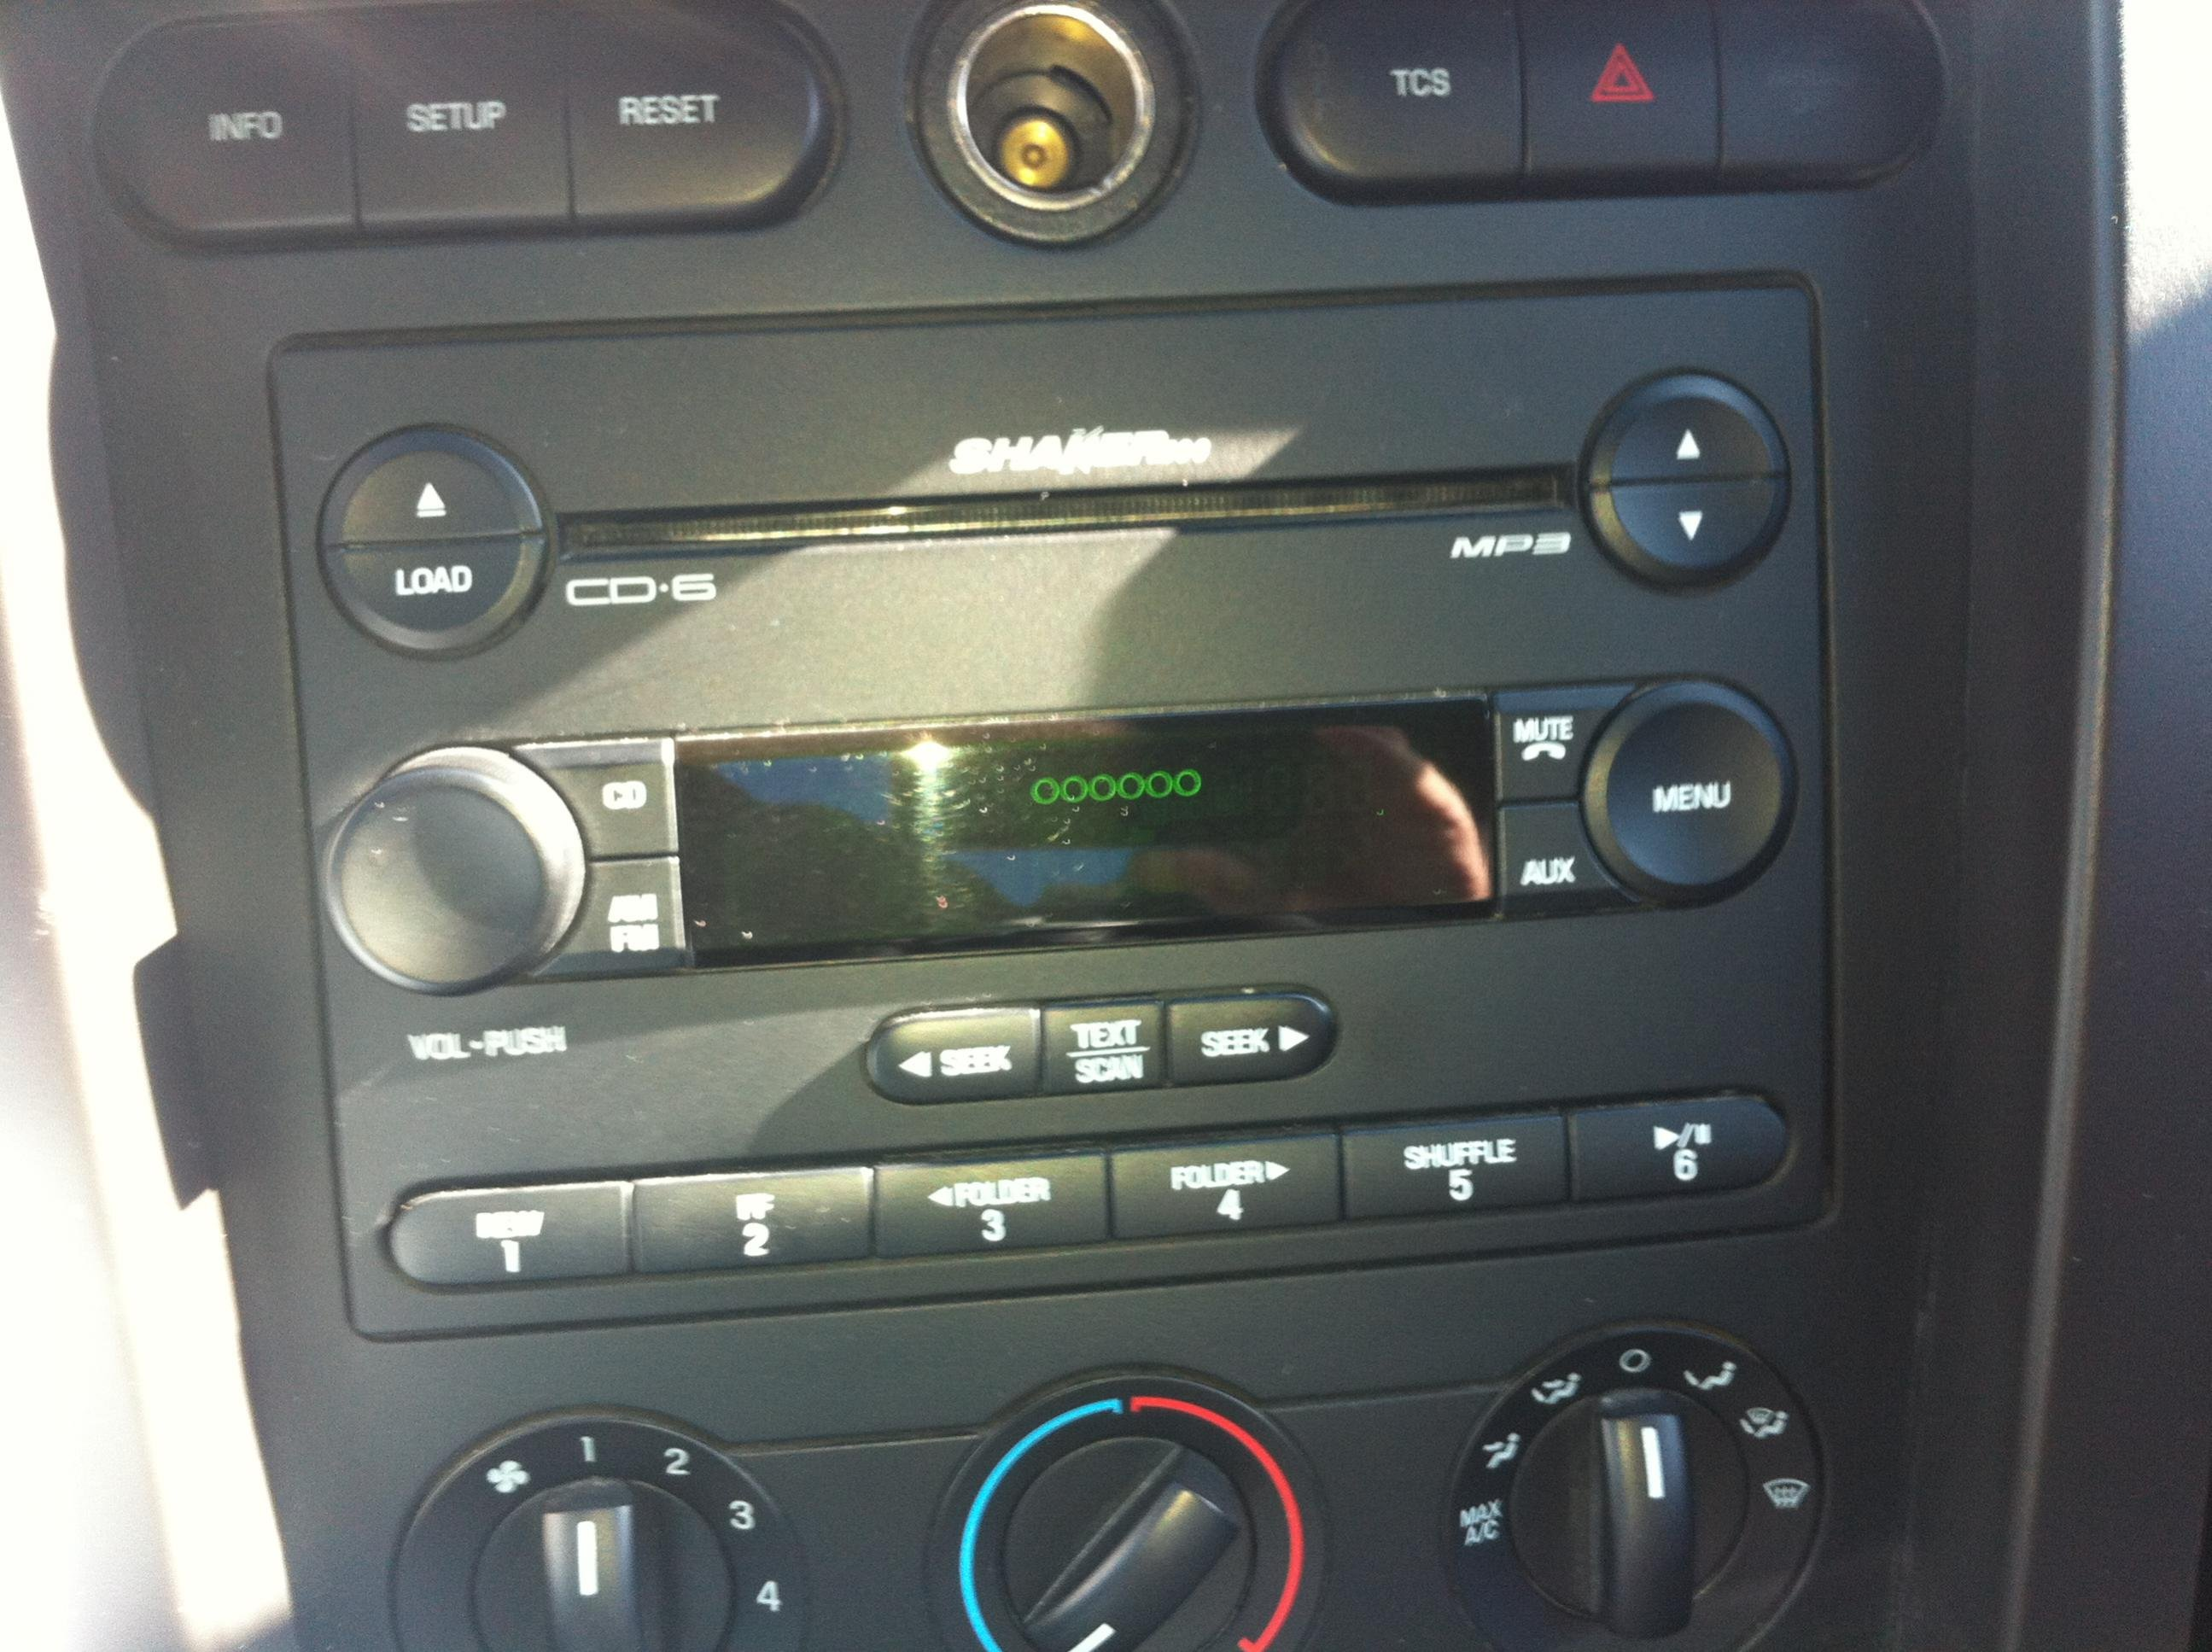 D Shaker Cd Error Blank on Ford Radio Wiring Diagram